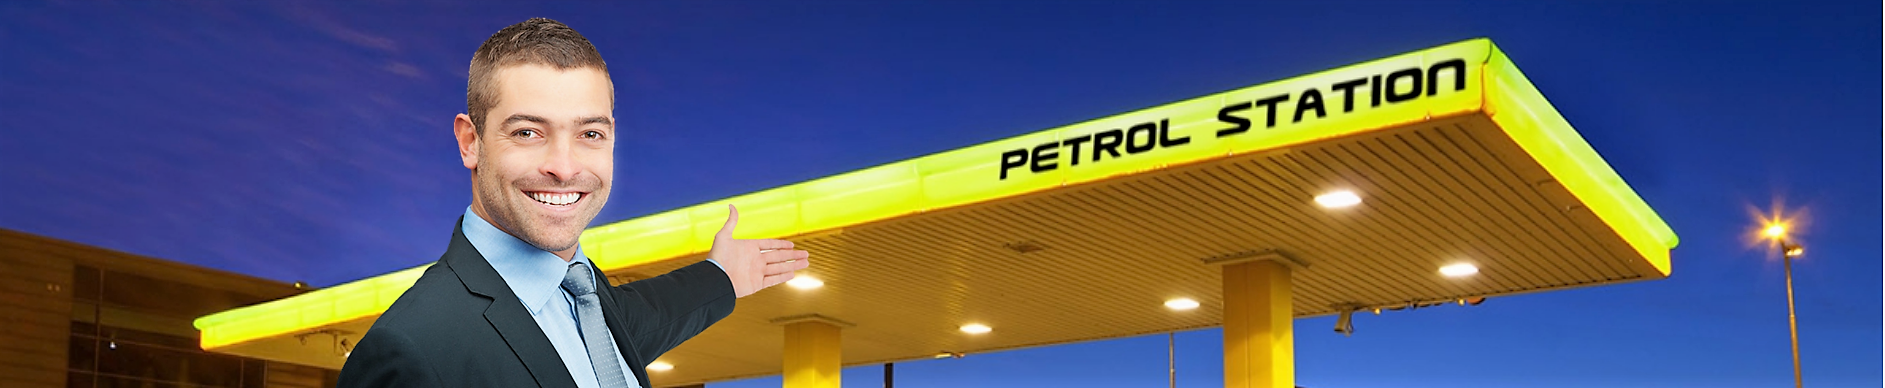 españa petrol station gasolinera